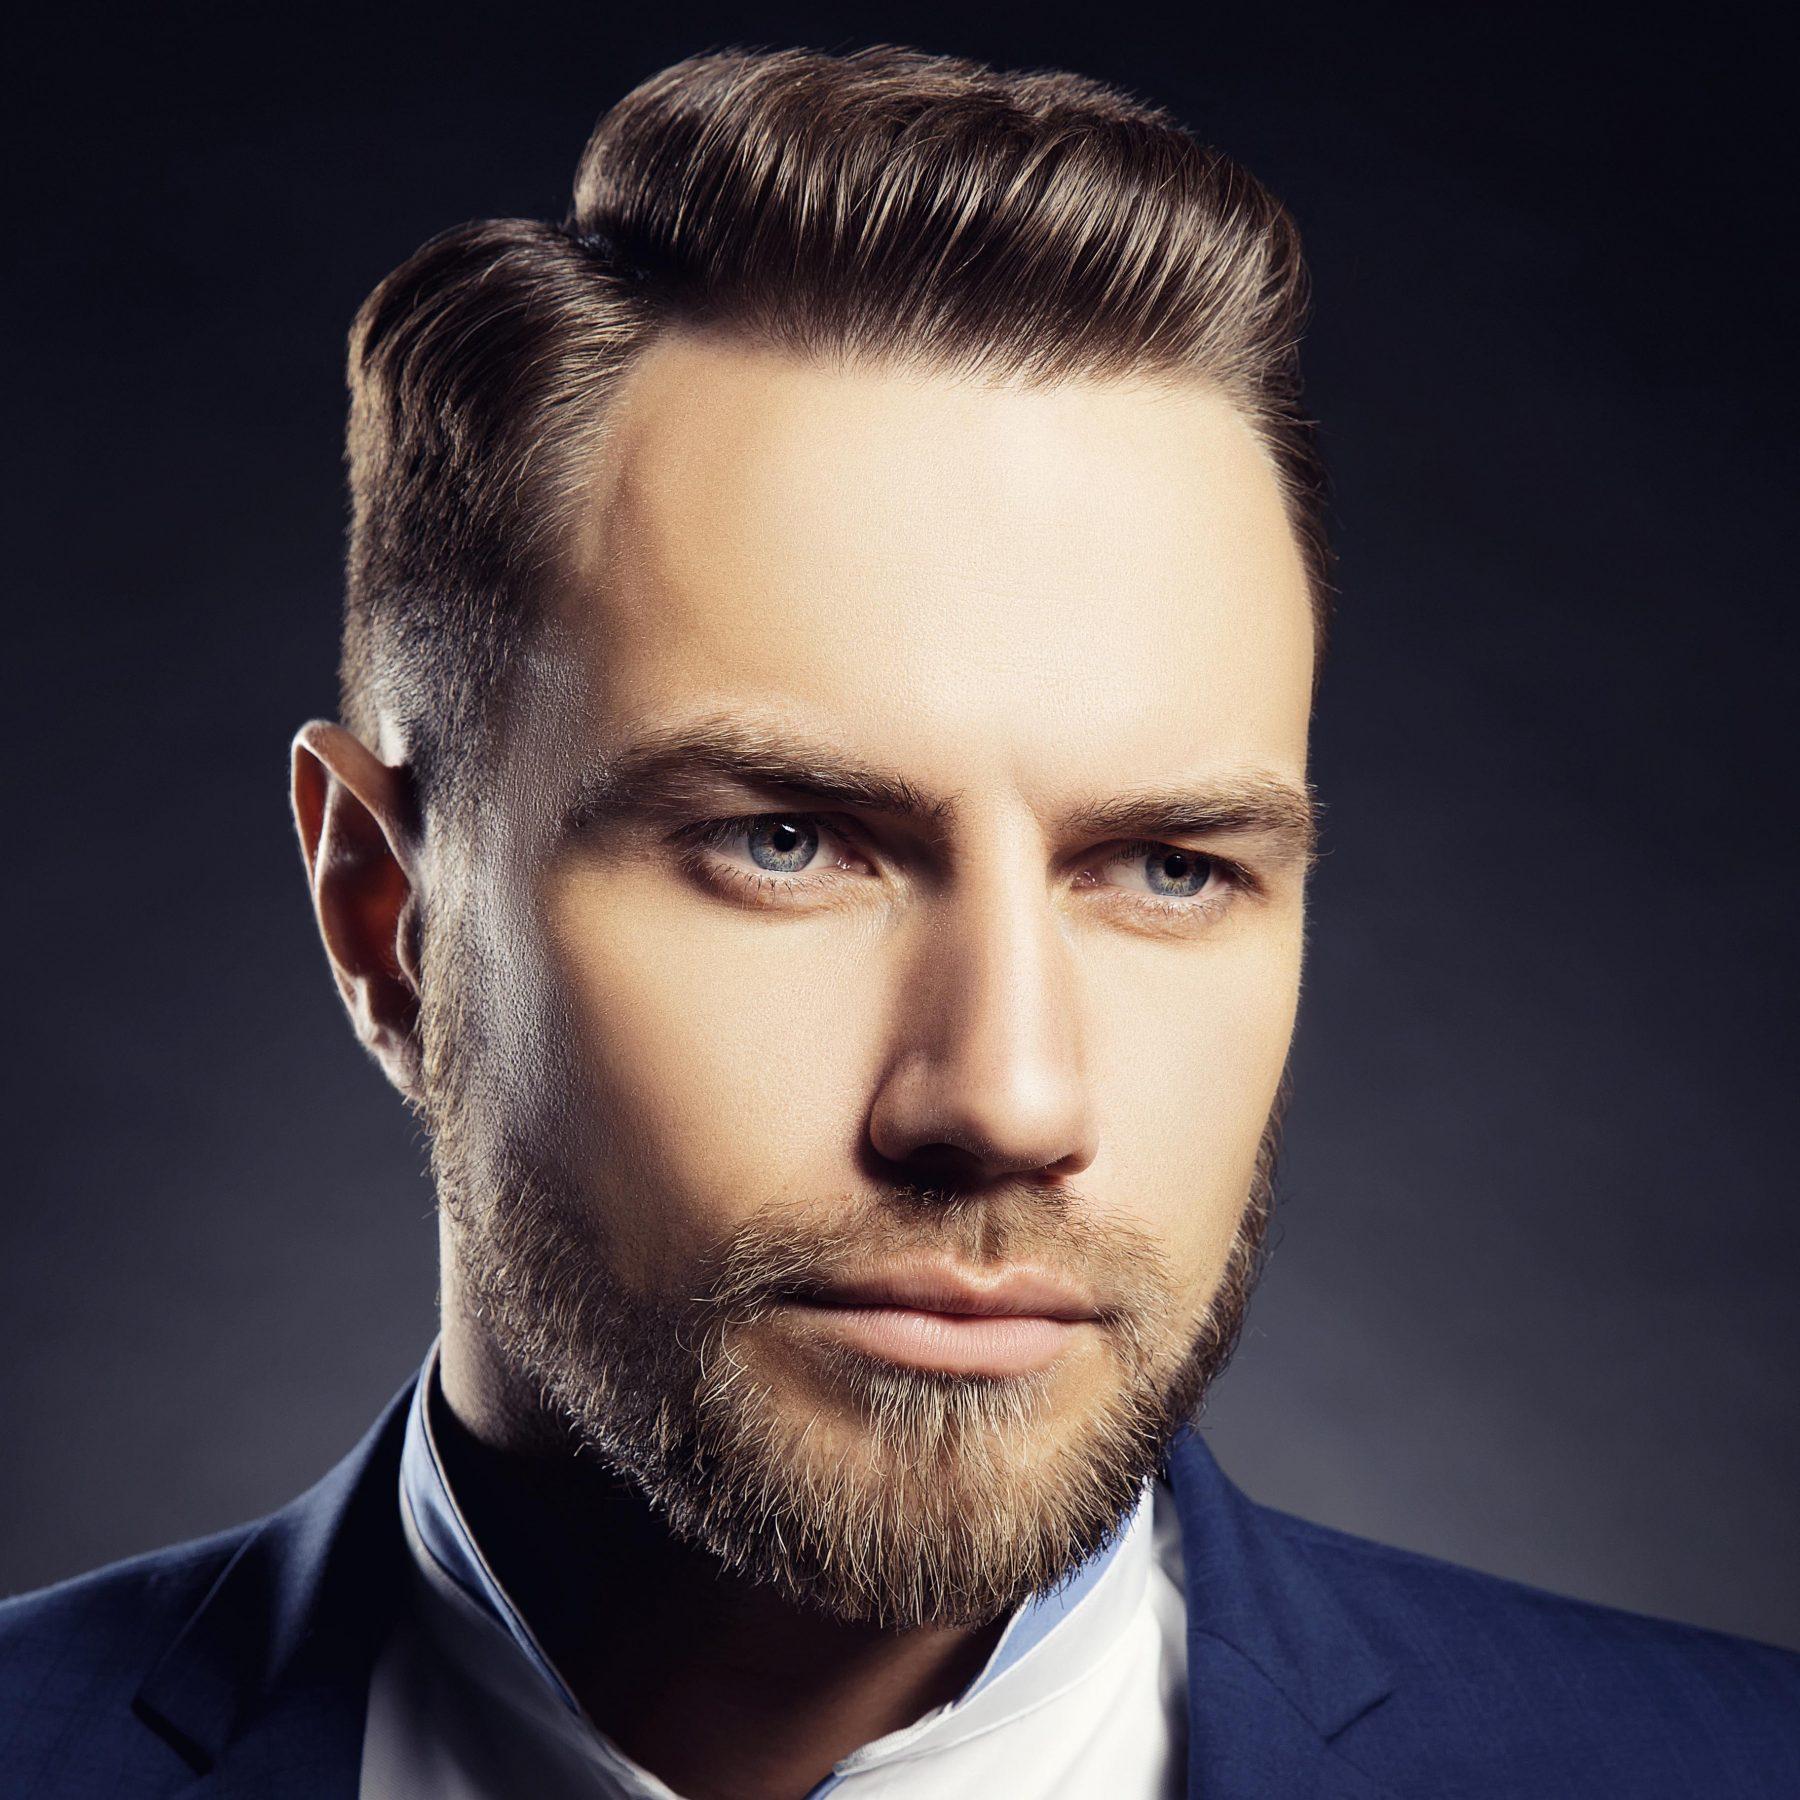 Platelet-Rich Plasma for Hair Loss